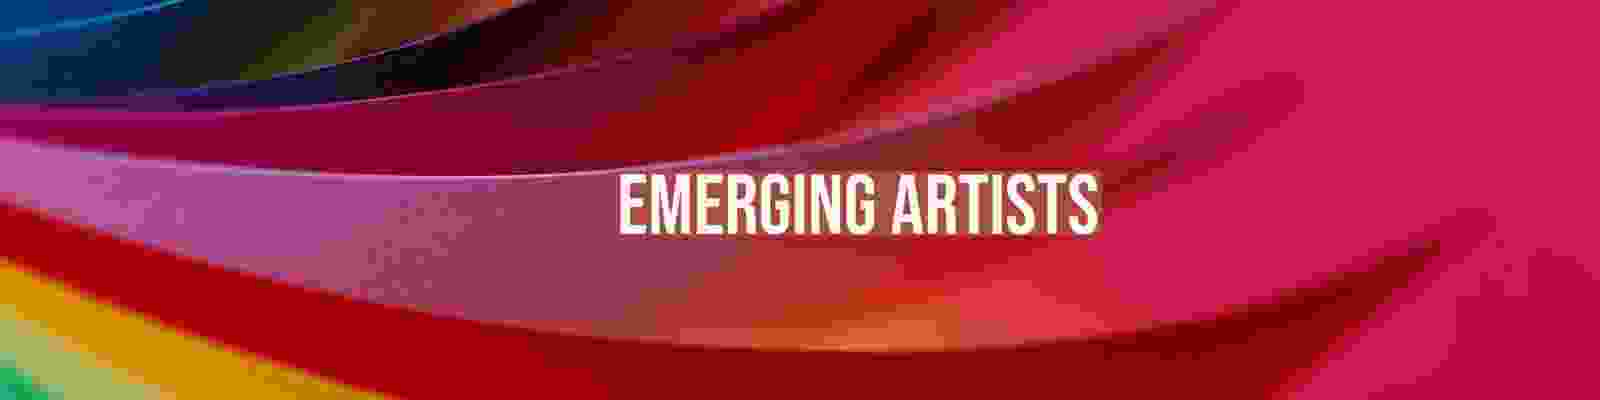 Low qual emerging artists 2